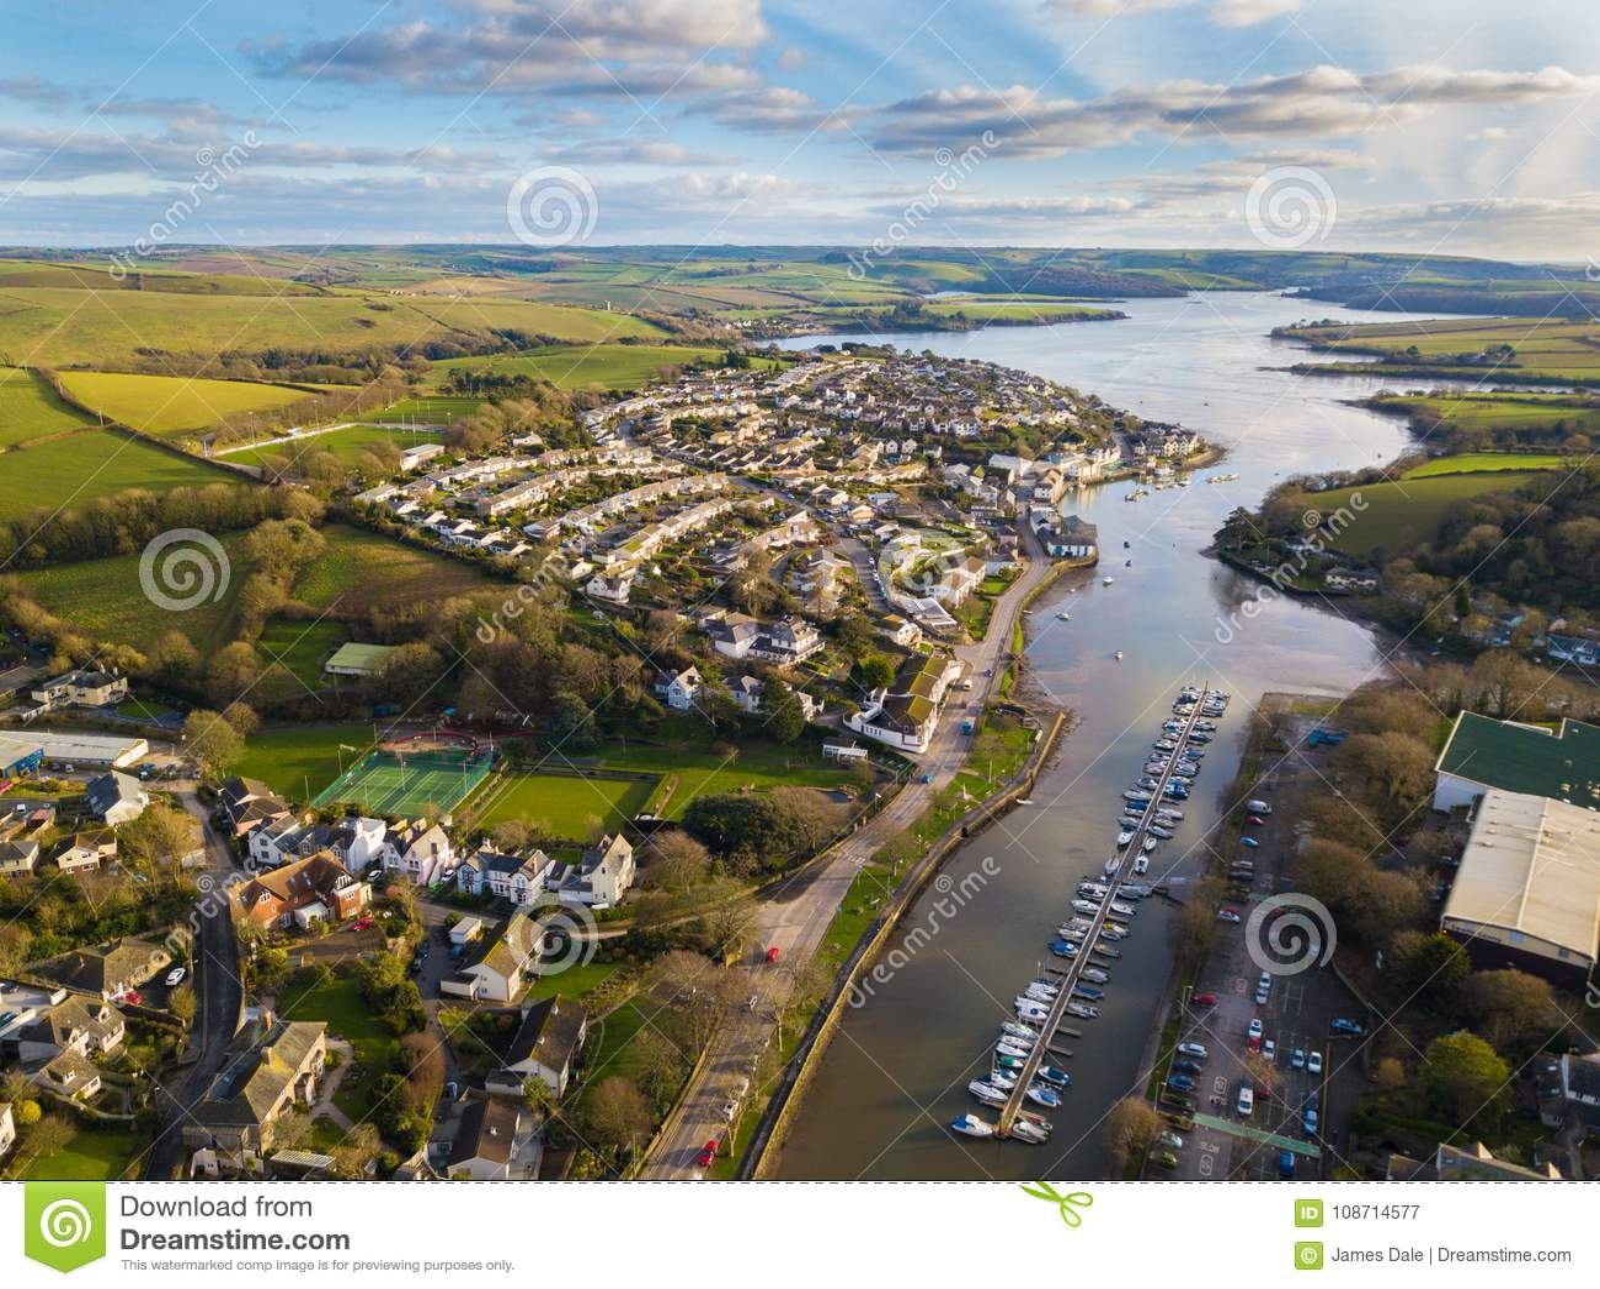 An aerial view of the Kingsbridge Estuary, Devon, UK